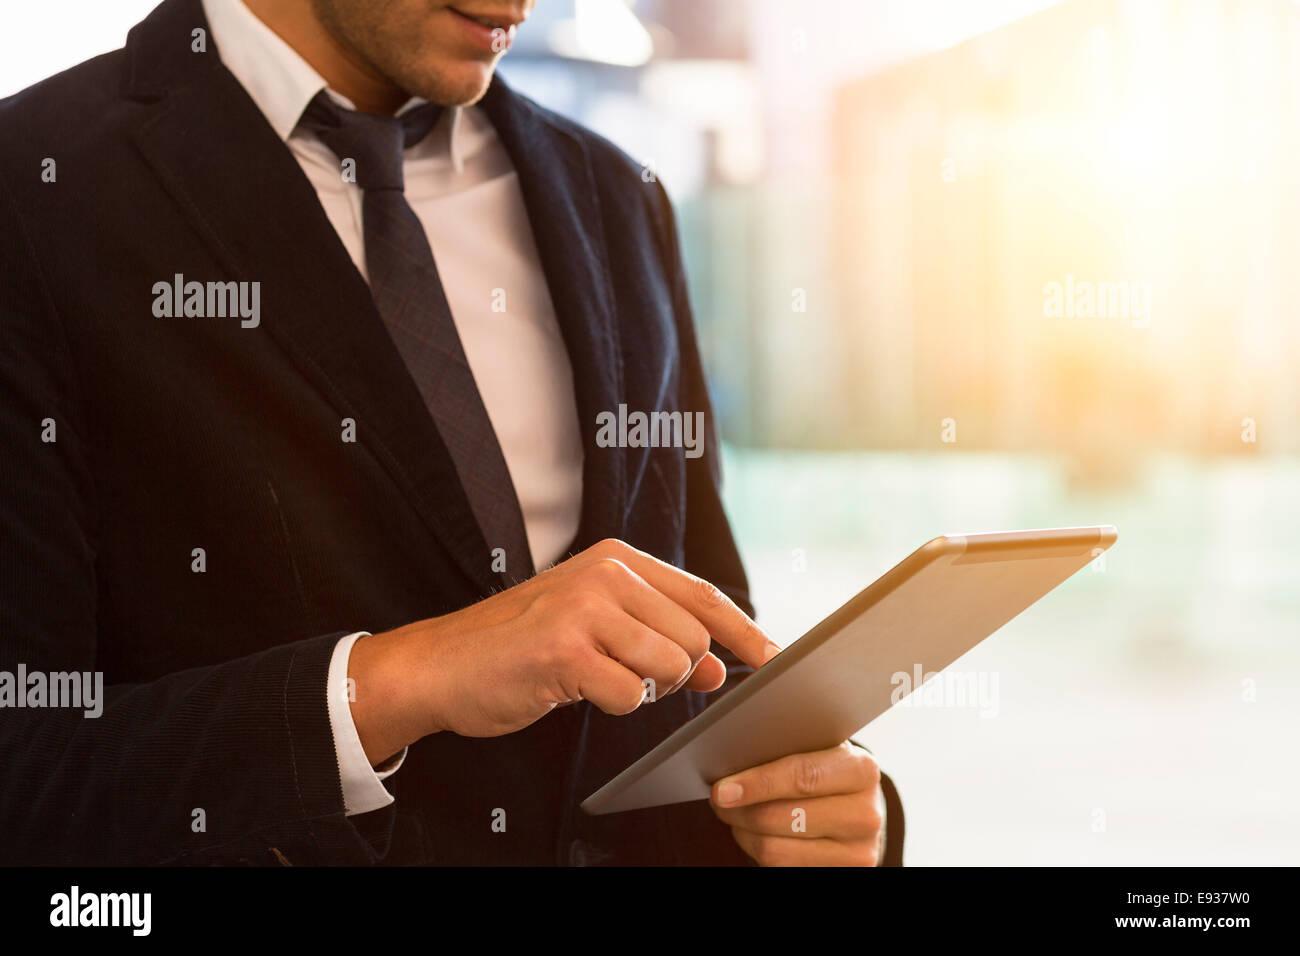 Businessman using digital Tablet Photo Stock